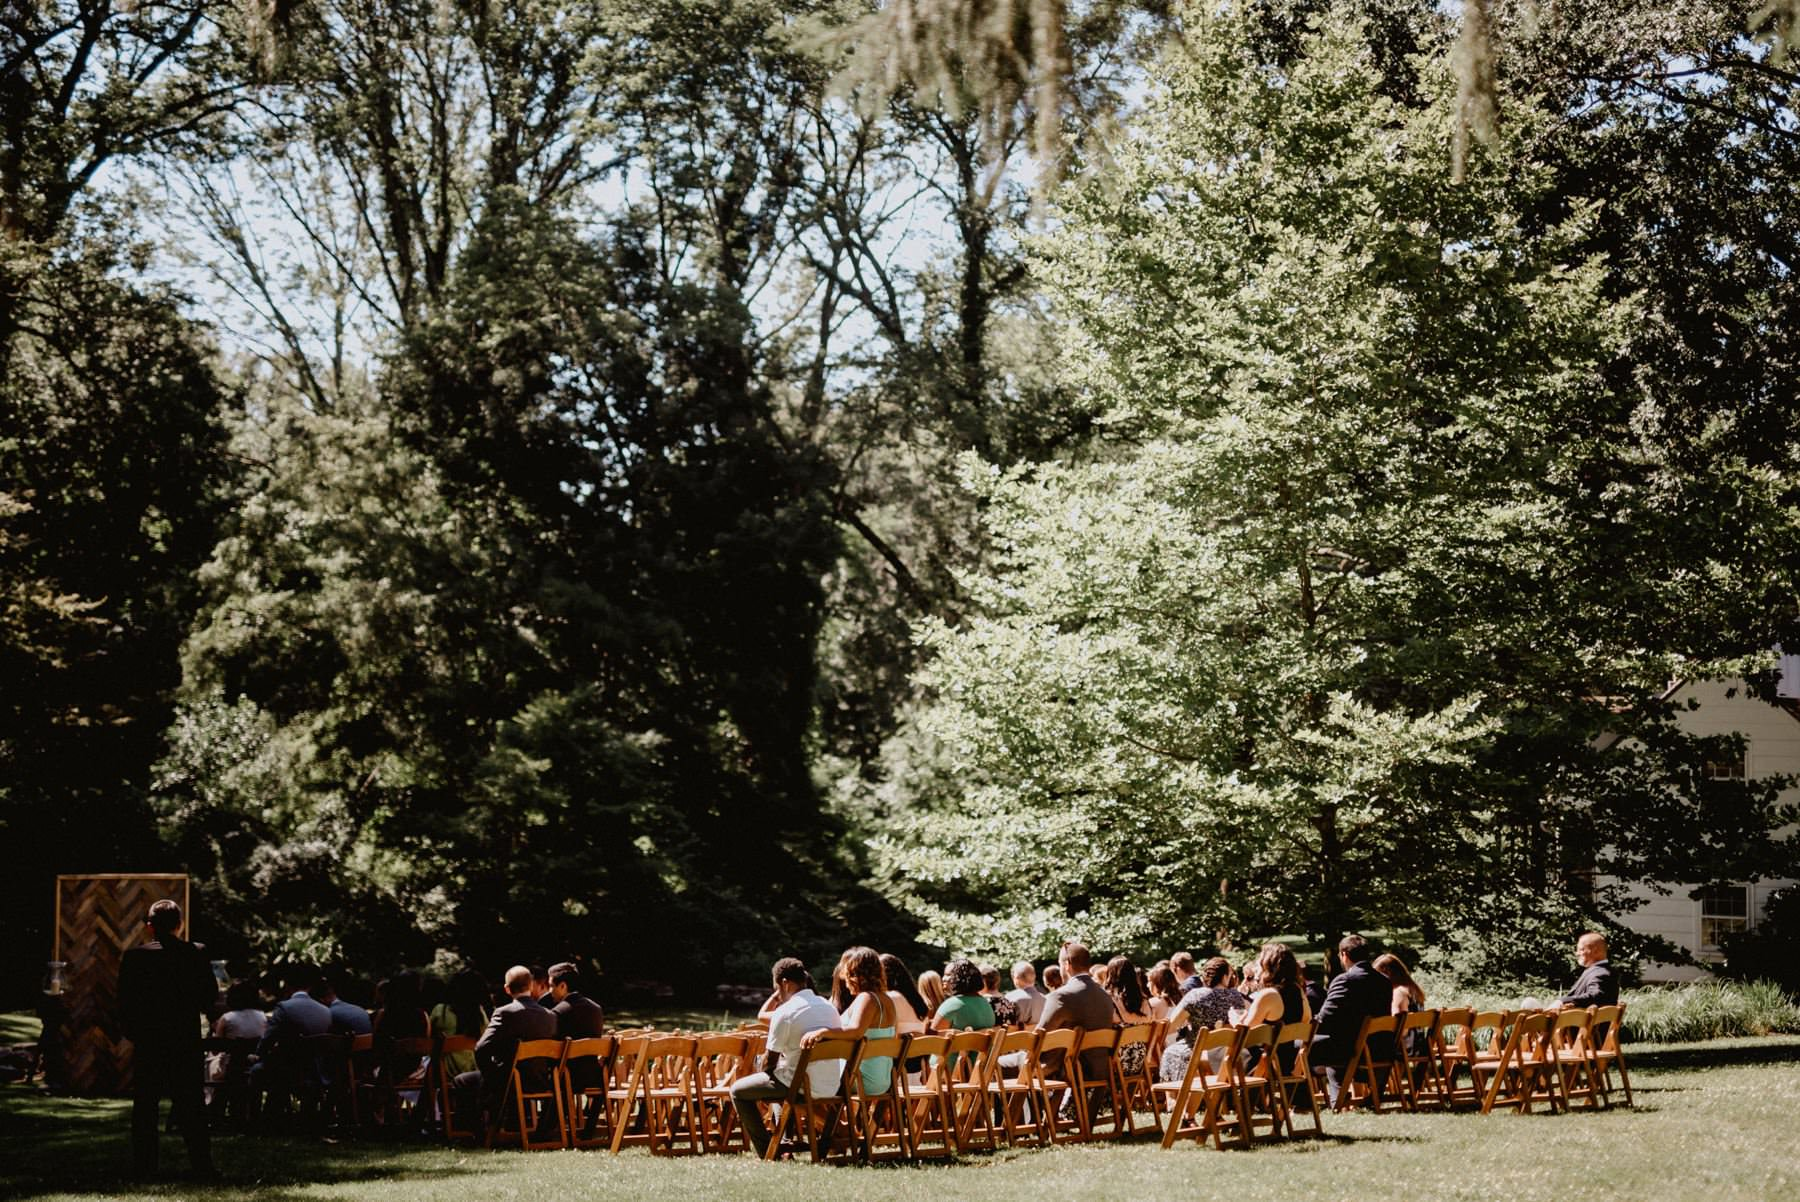 Appleford-estate-wedding-81.jpg